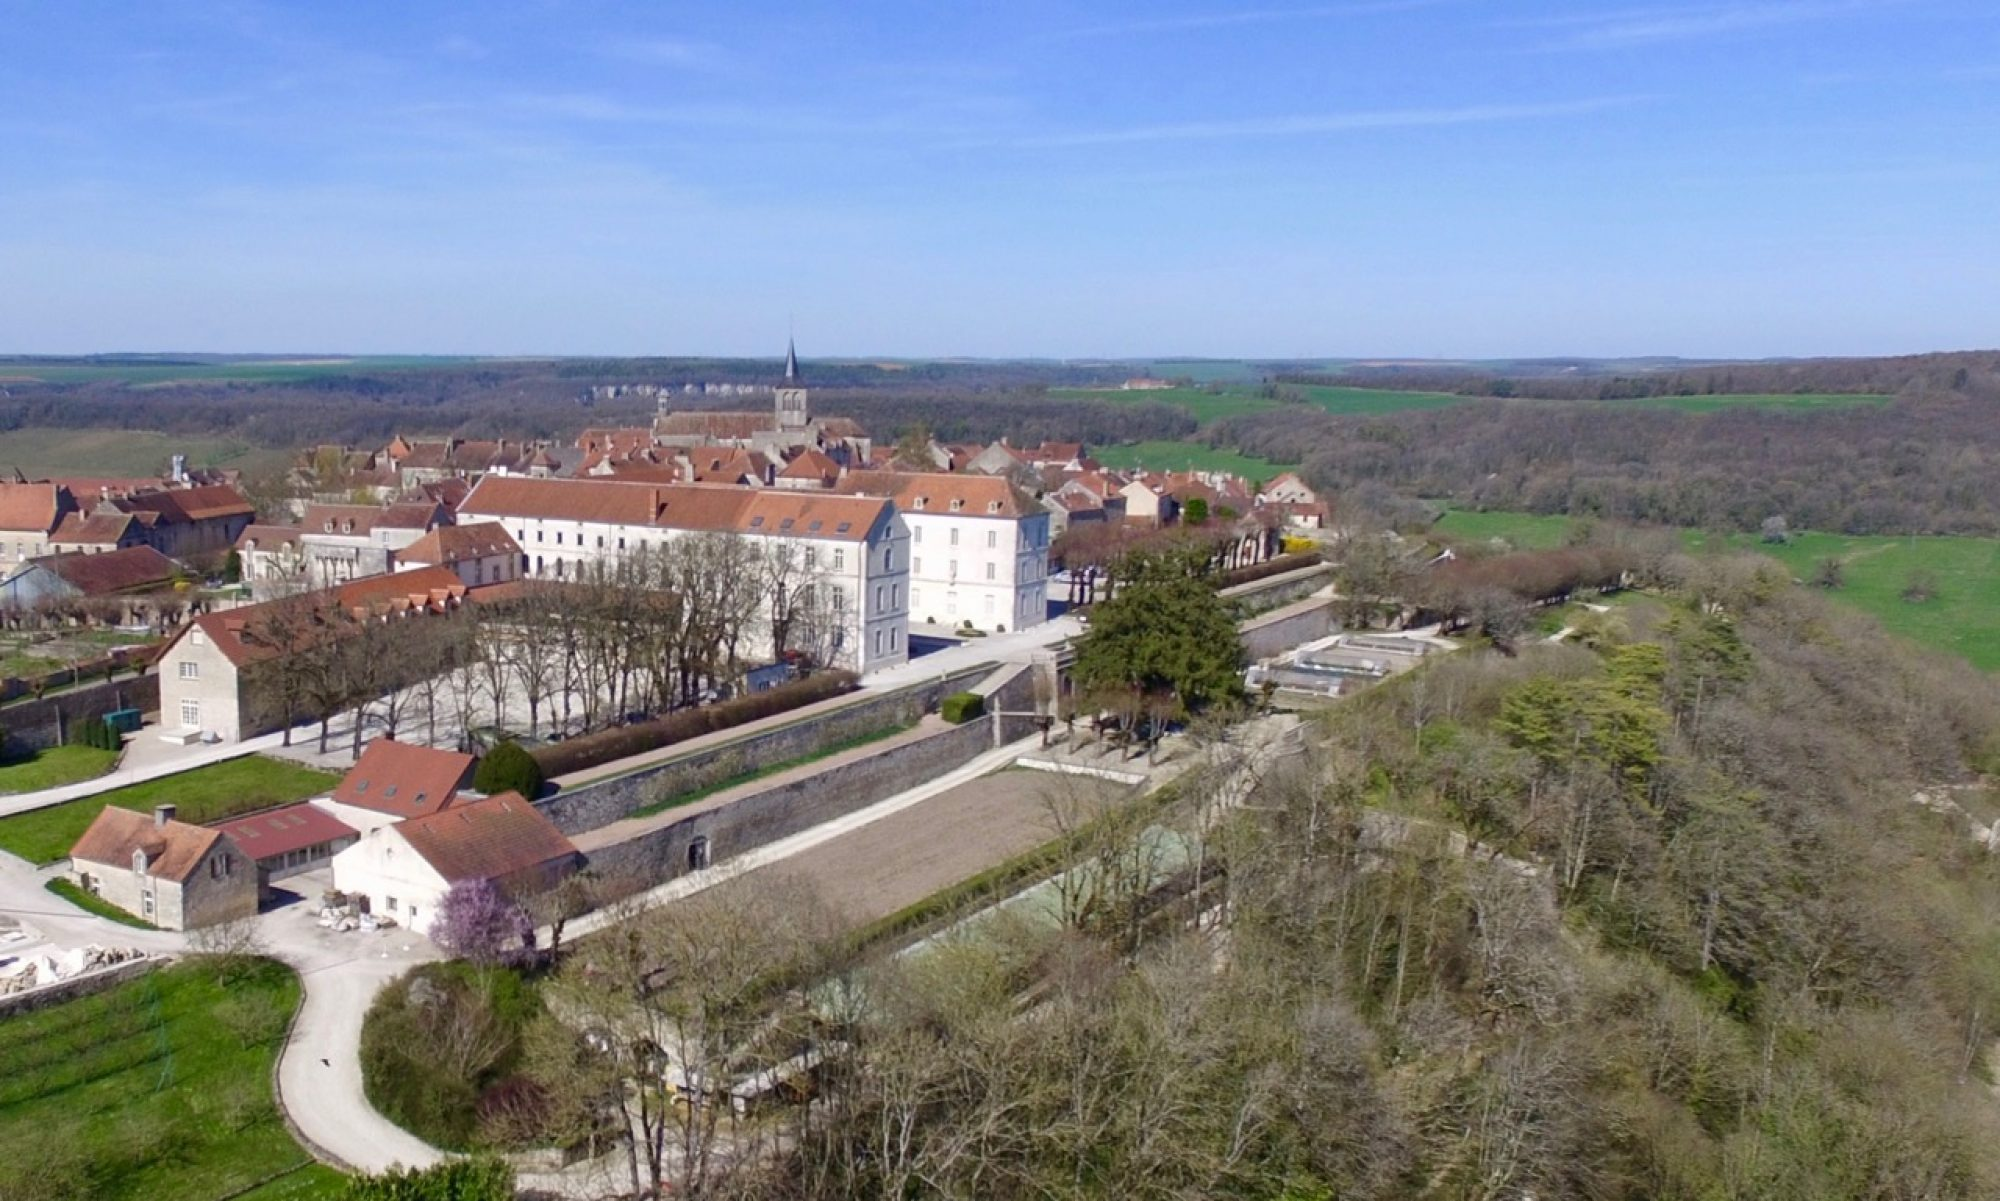 Abtei Saint-Joseph de Clairval